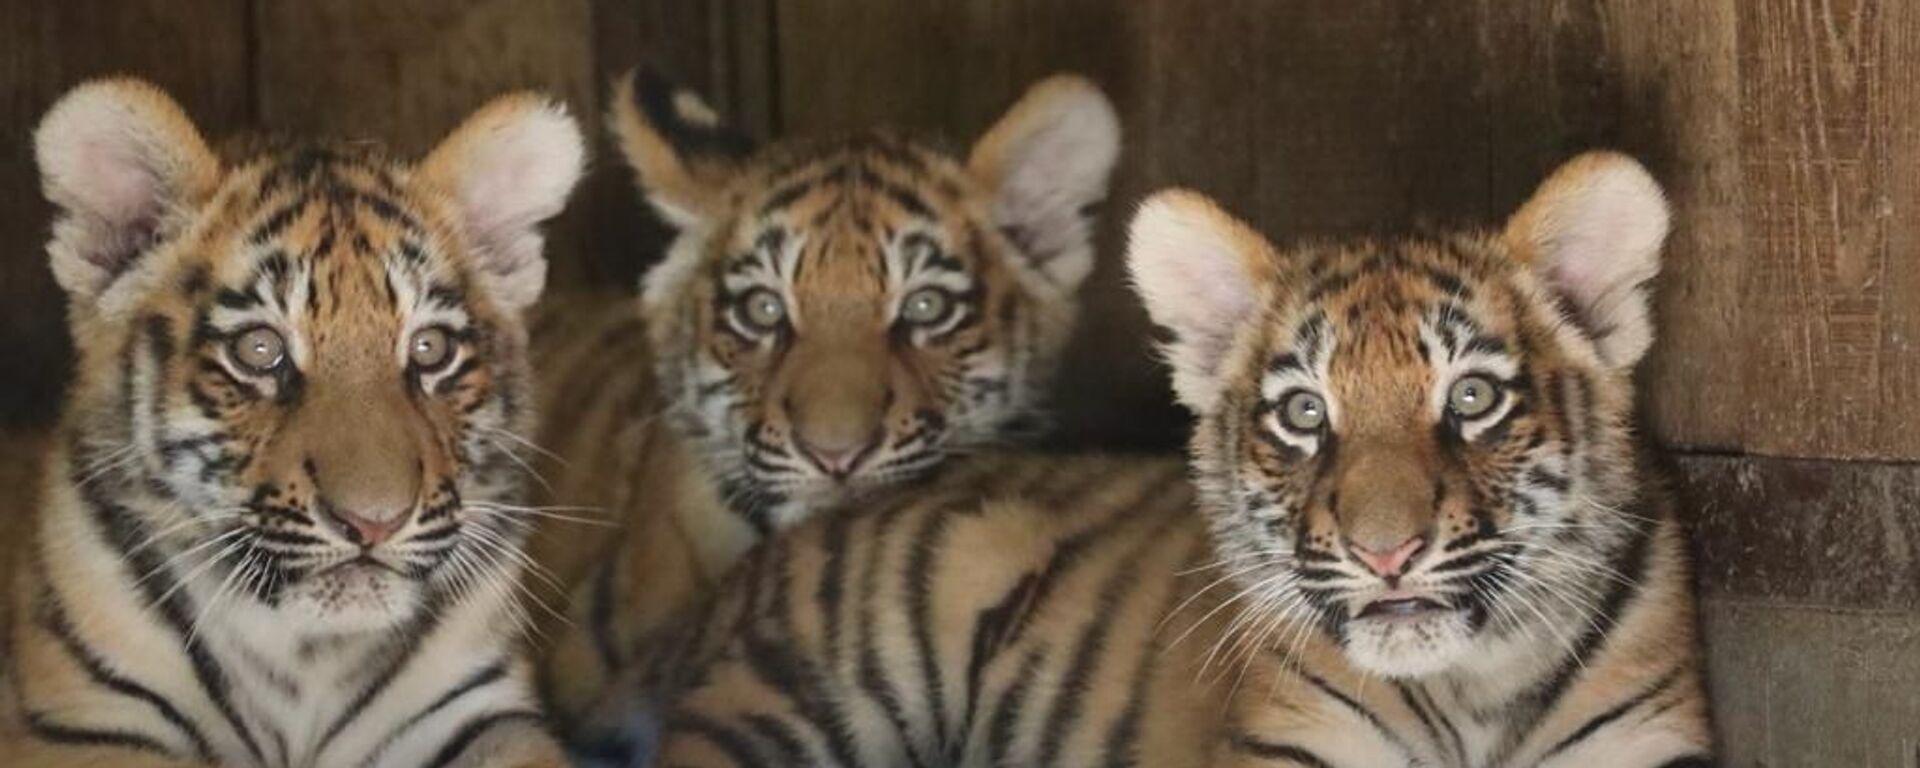 I cuccioli di tigre siberiana Krai, Zov, Alina al parco Natura Viva - Sputnik Italia, 1920, 14.11.2020